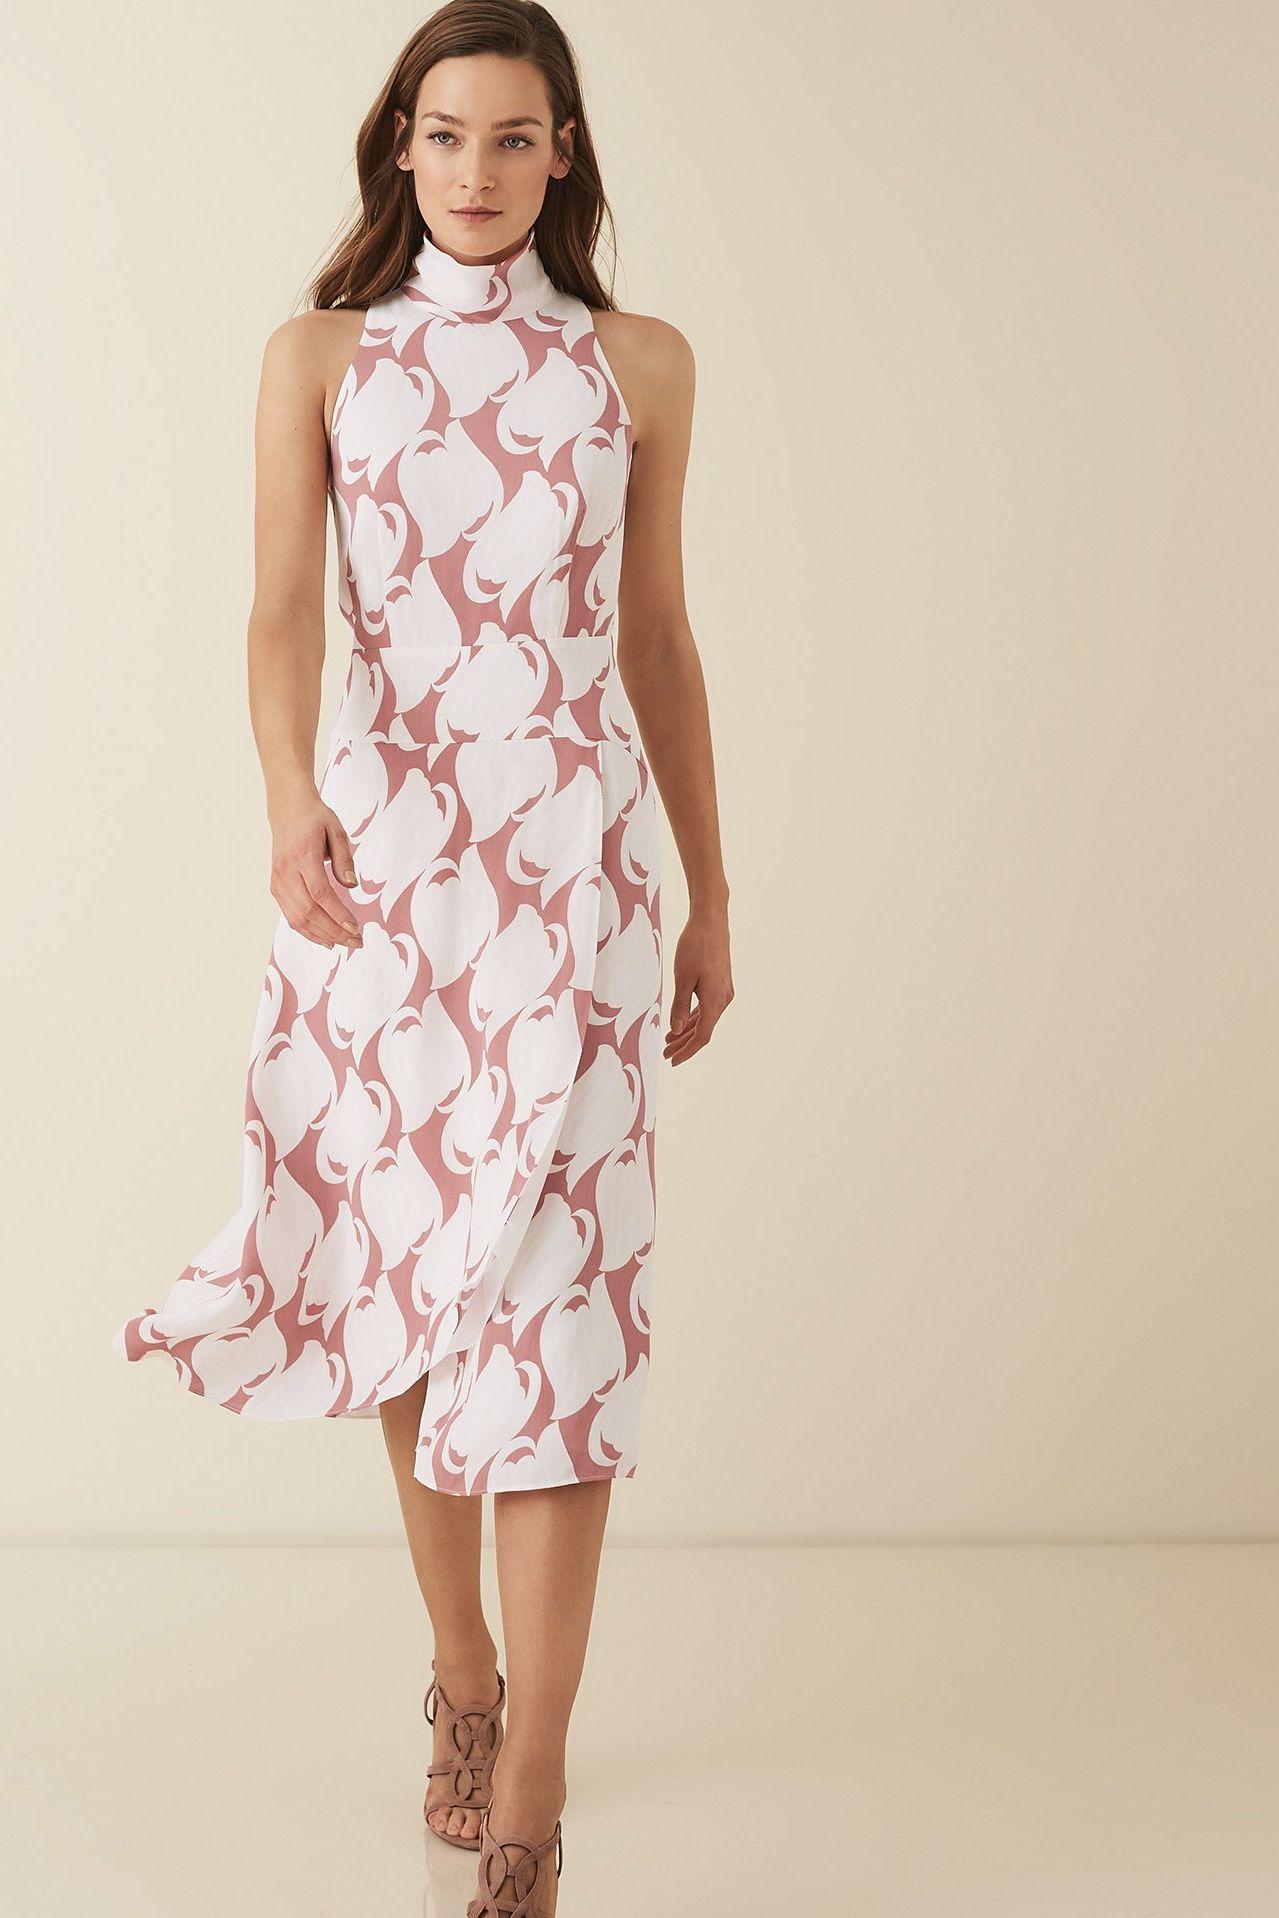 Reiss Doriana dress